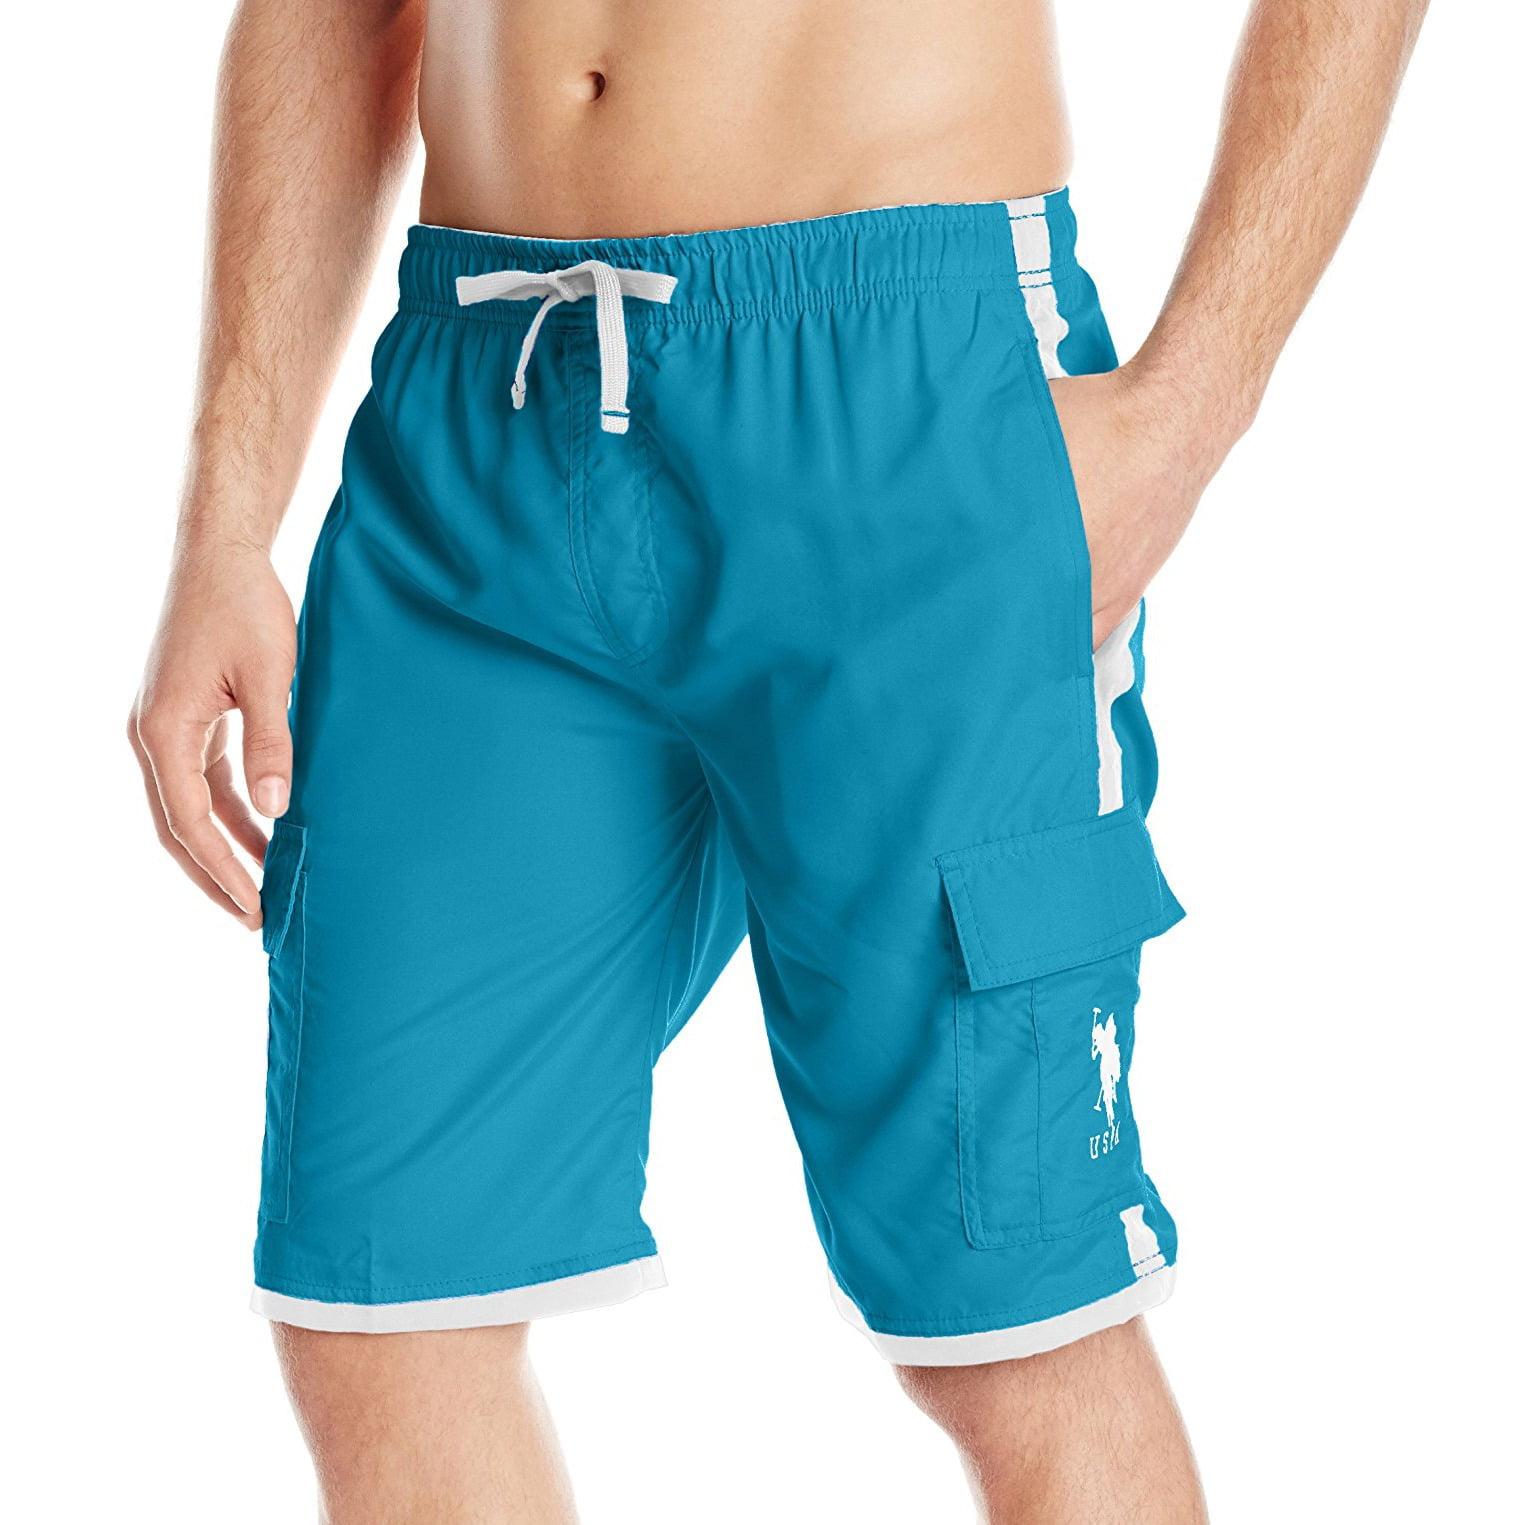 U.S. Polo Assn. NEW Blue Mens Size Large L Drawstring Board Shorts